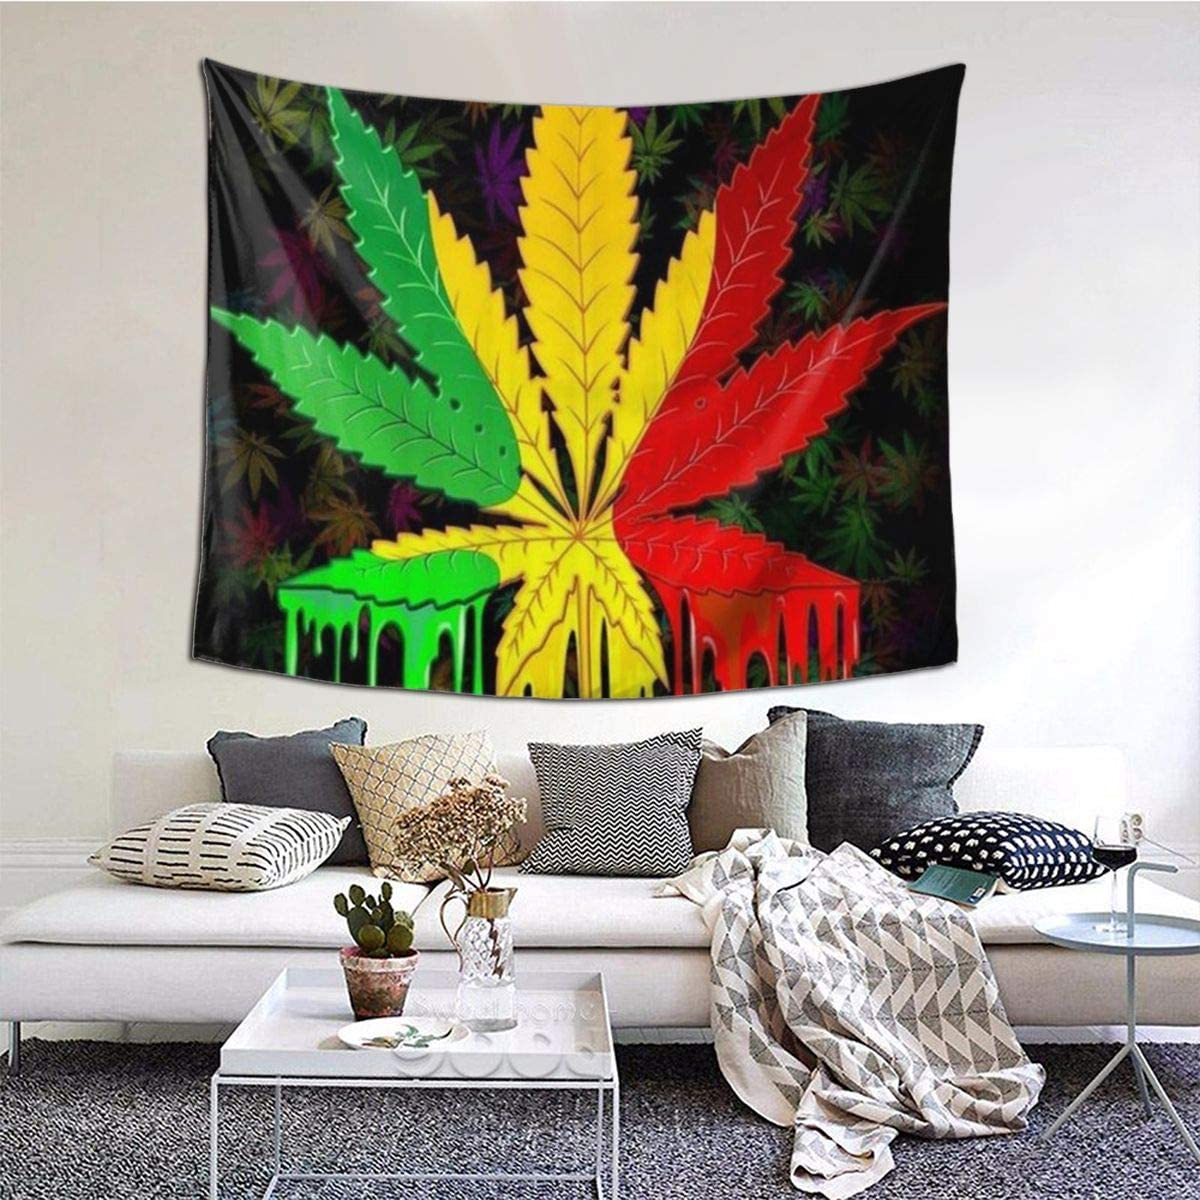 LASINSU Tapiz de Regalo,Reggae Rasta Marihuana Leaf Weed,Tapiz Bohemio diseño para Colgar en la Pared,Sala de Estar Dormitorio